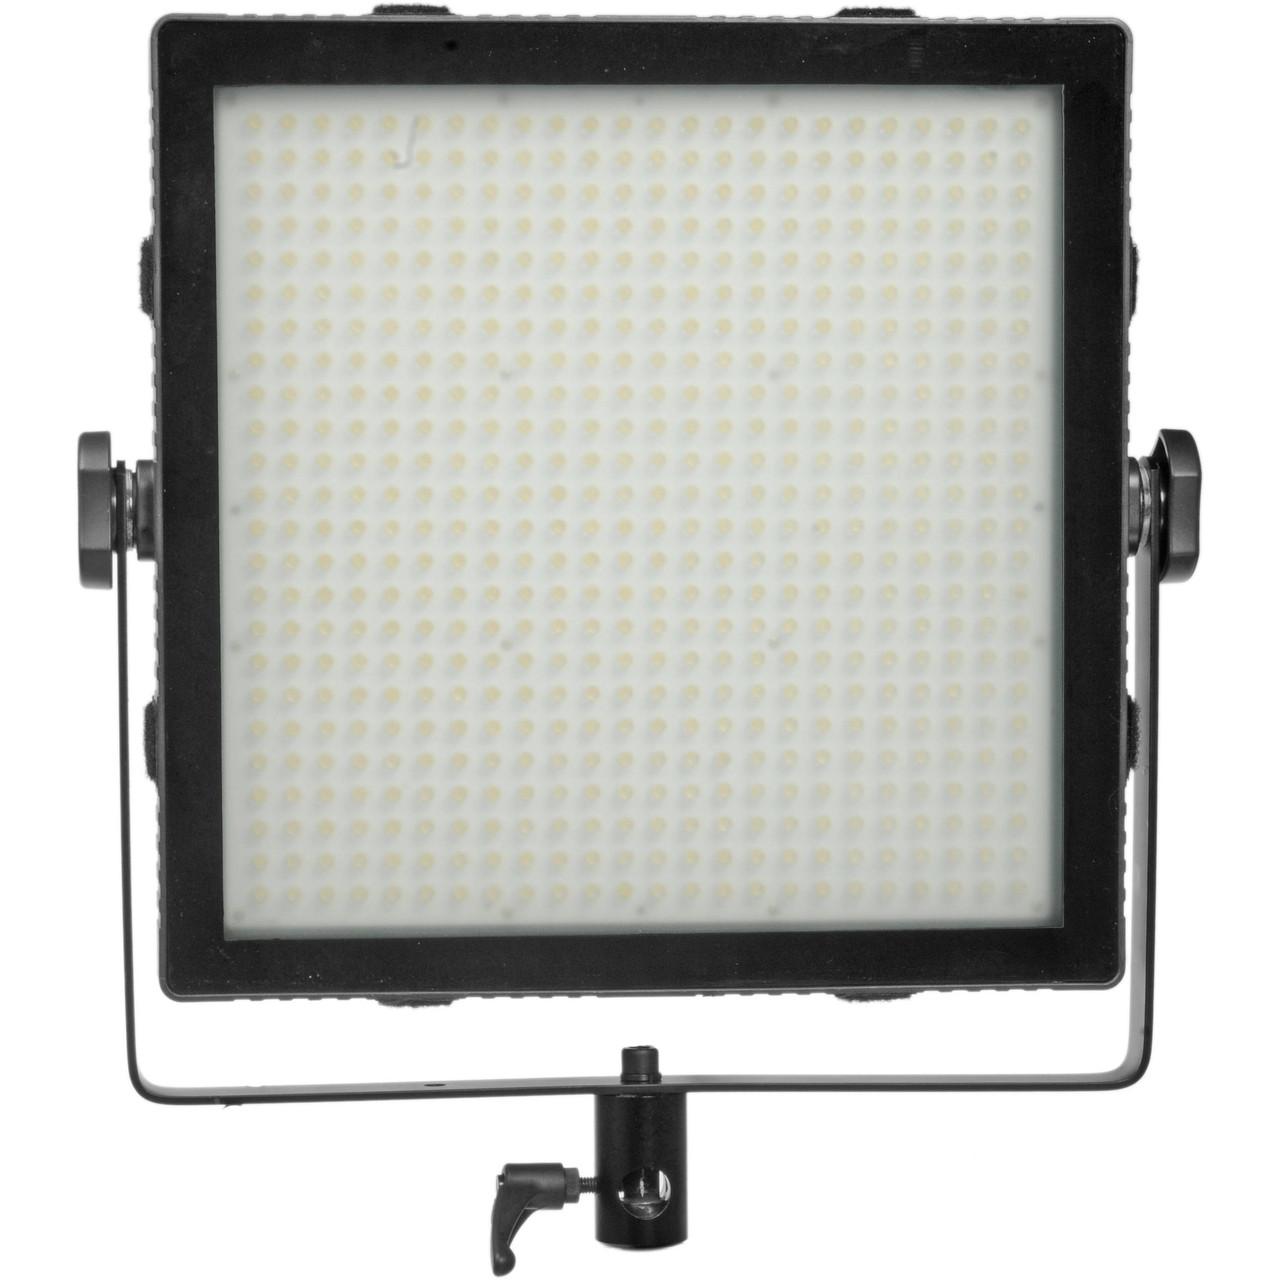 Dedolight Felloni Tecpro 30 Degree High Output Tungsten LED Light (TP-LONI-T30HO)